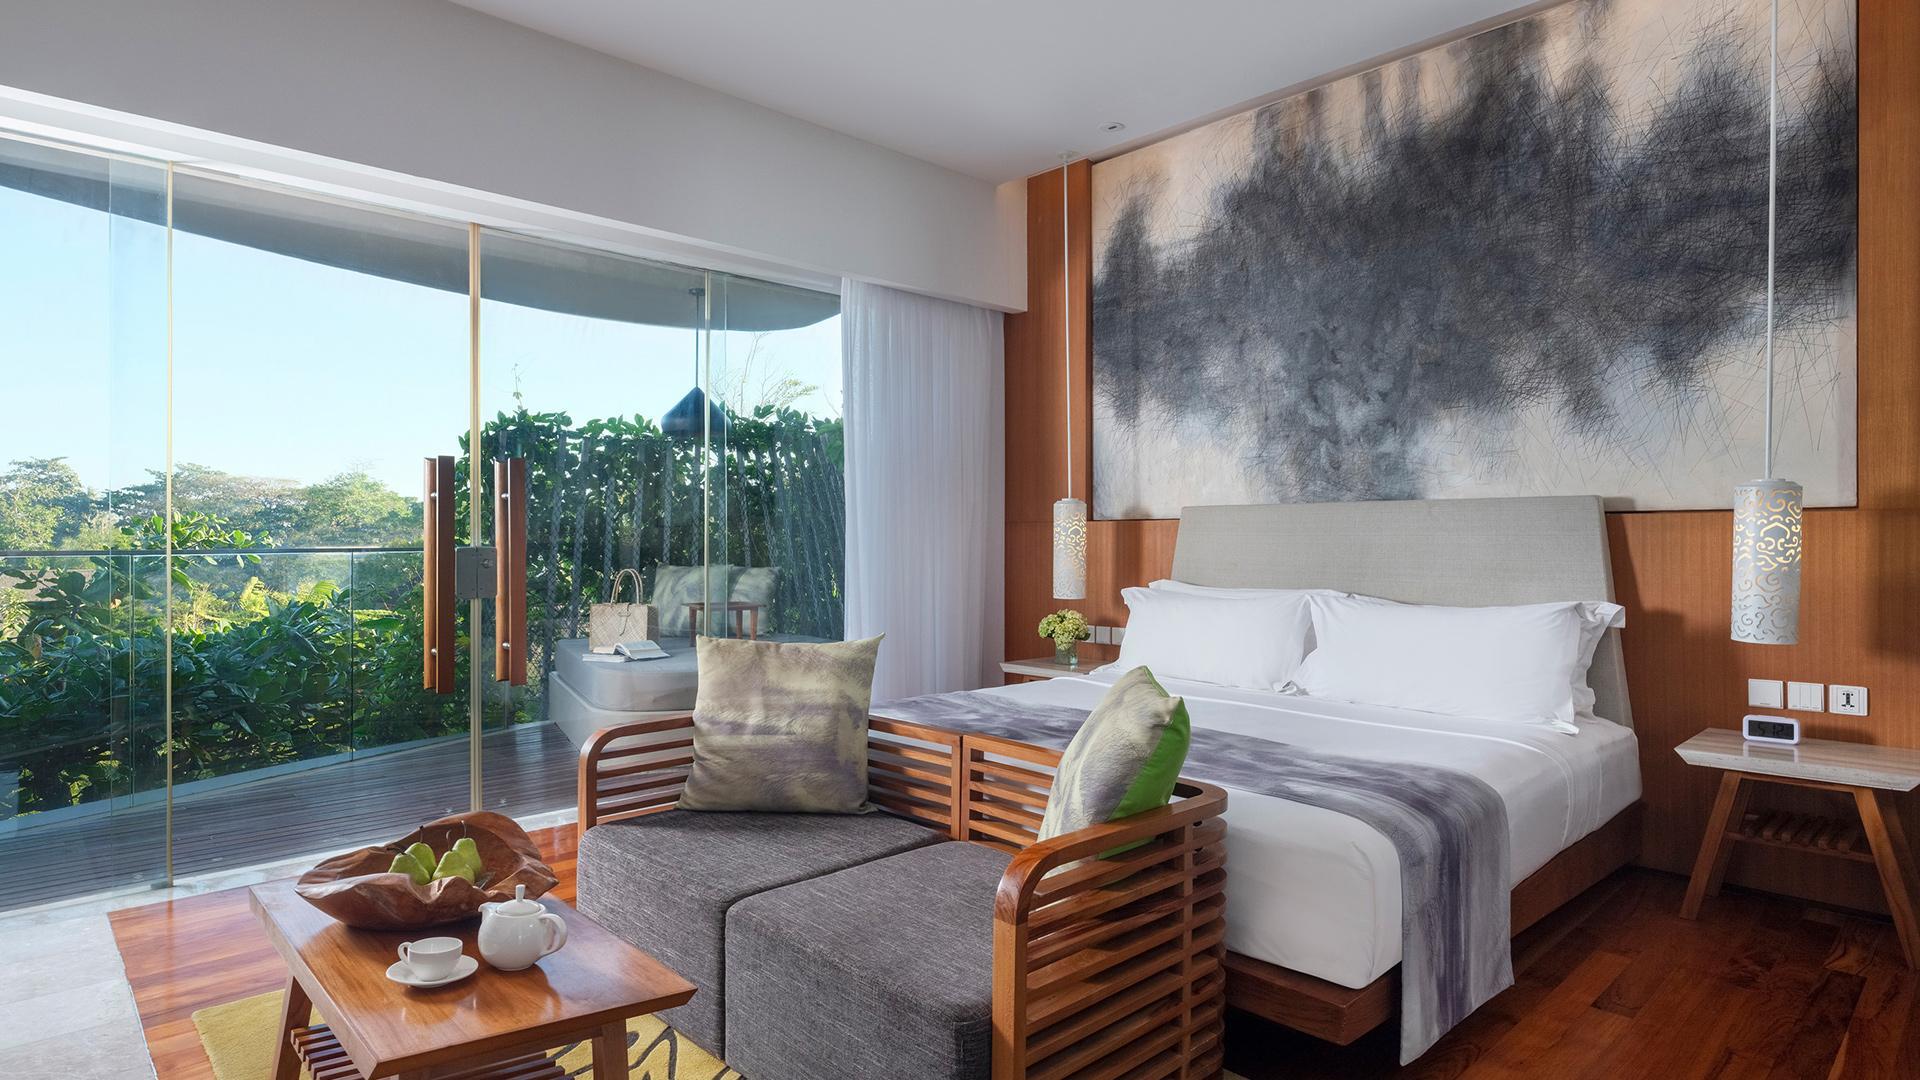 Impressive Nest Suite image 1 at Maya Sanur Resort & Spa by Kota Denpasar, Bali, Indonesia